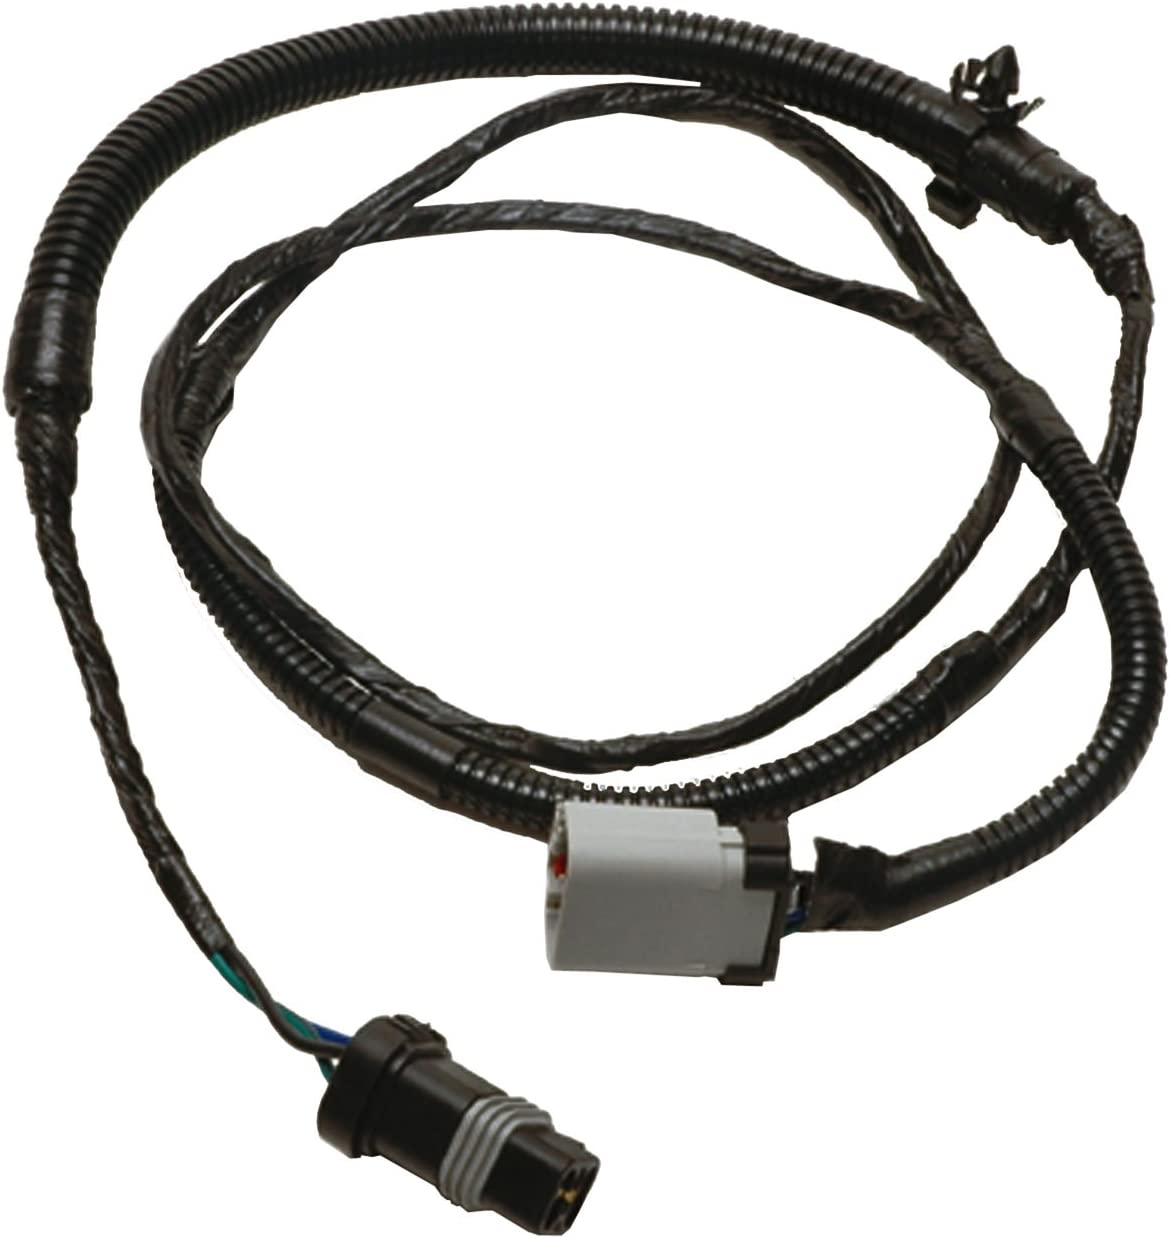 [SCHEMATICS_48EU]  Amazon.com: Delphi FA10002 Wiring Harness: Automotive   Delphi Wiring Harness      Amazon.com